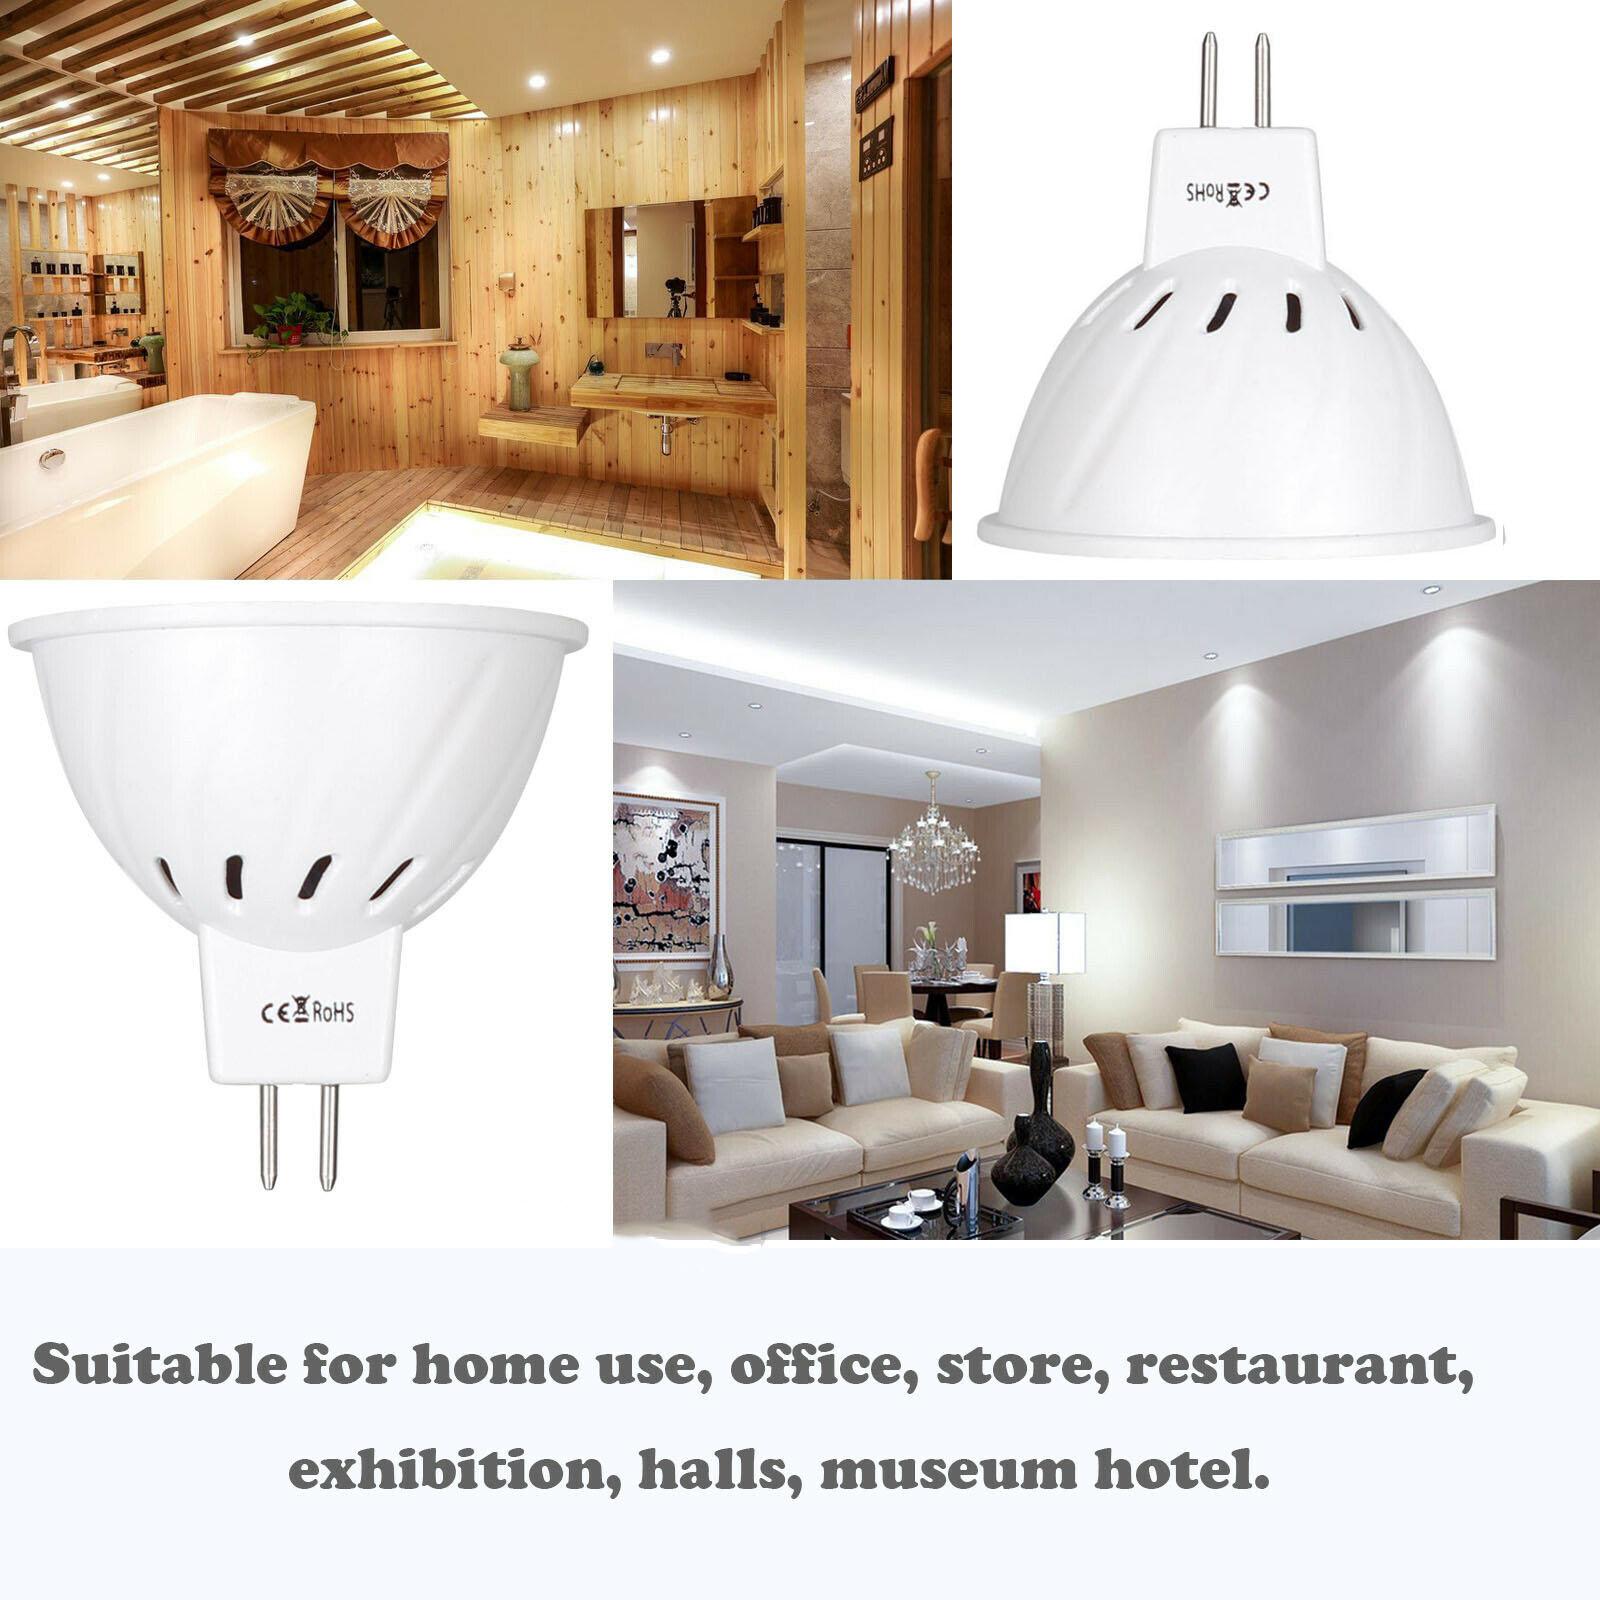 10x MR16 12 V-24 V светодиодный лампы светильник 220V SMD 2835 Светодиодный точечный светильник с лампой мощностью 4W 6W 8W 36 54 72 светодиодный теплый холодн...